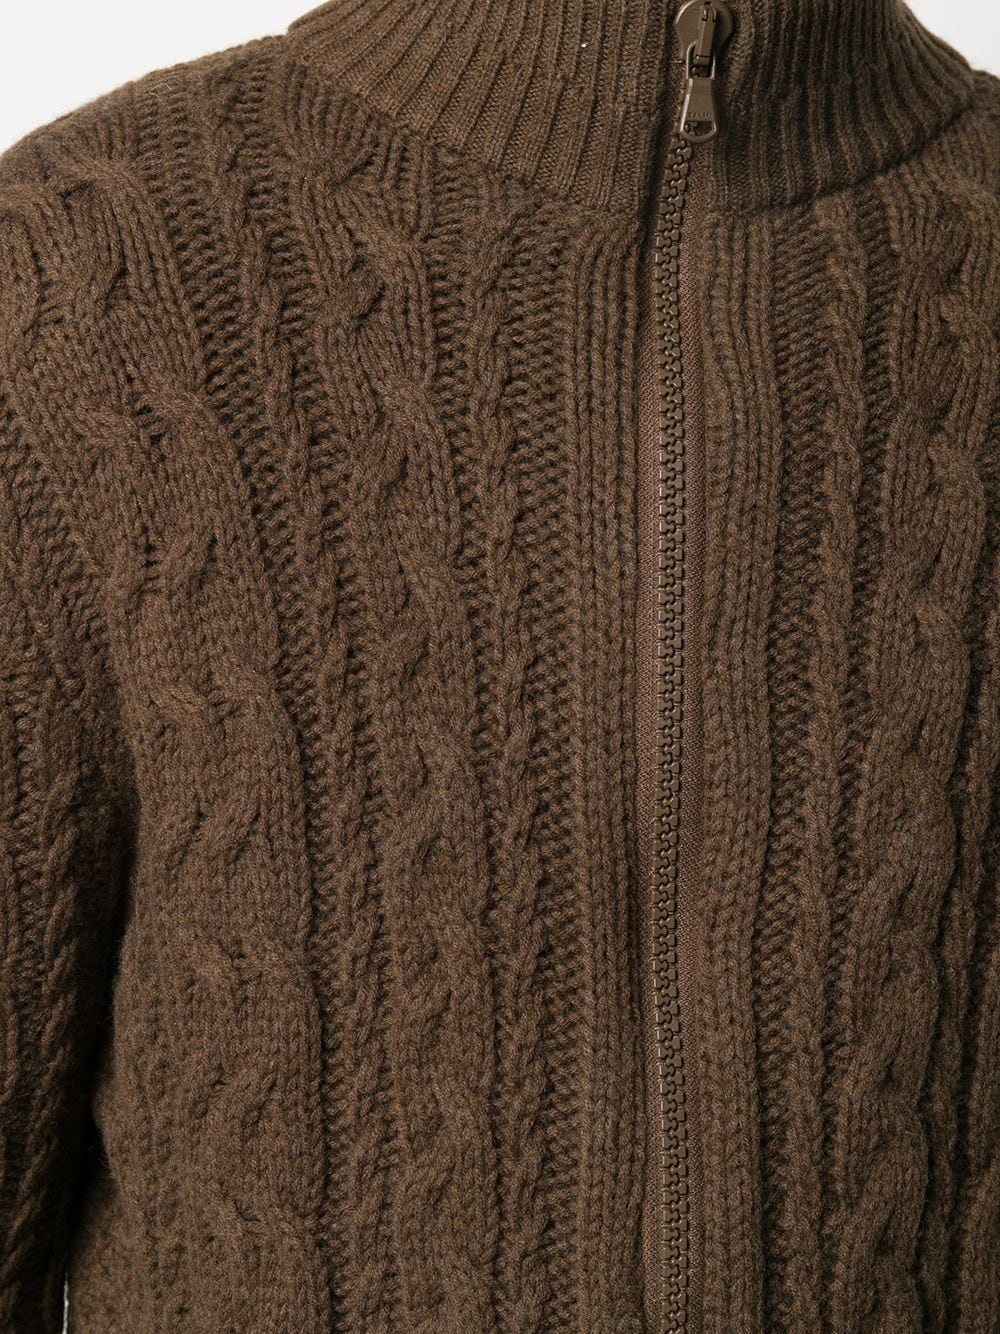 Sepia brown wool zip-through cable knit sweater   ALBERTO ASPESI |  | M352-396501223